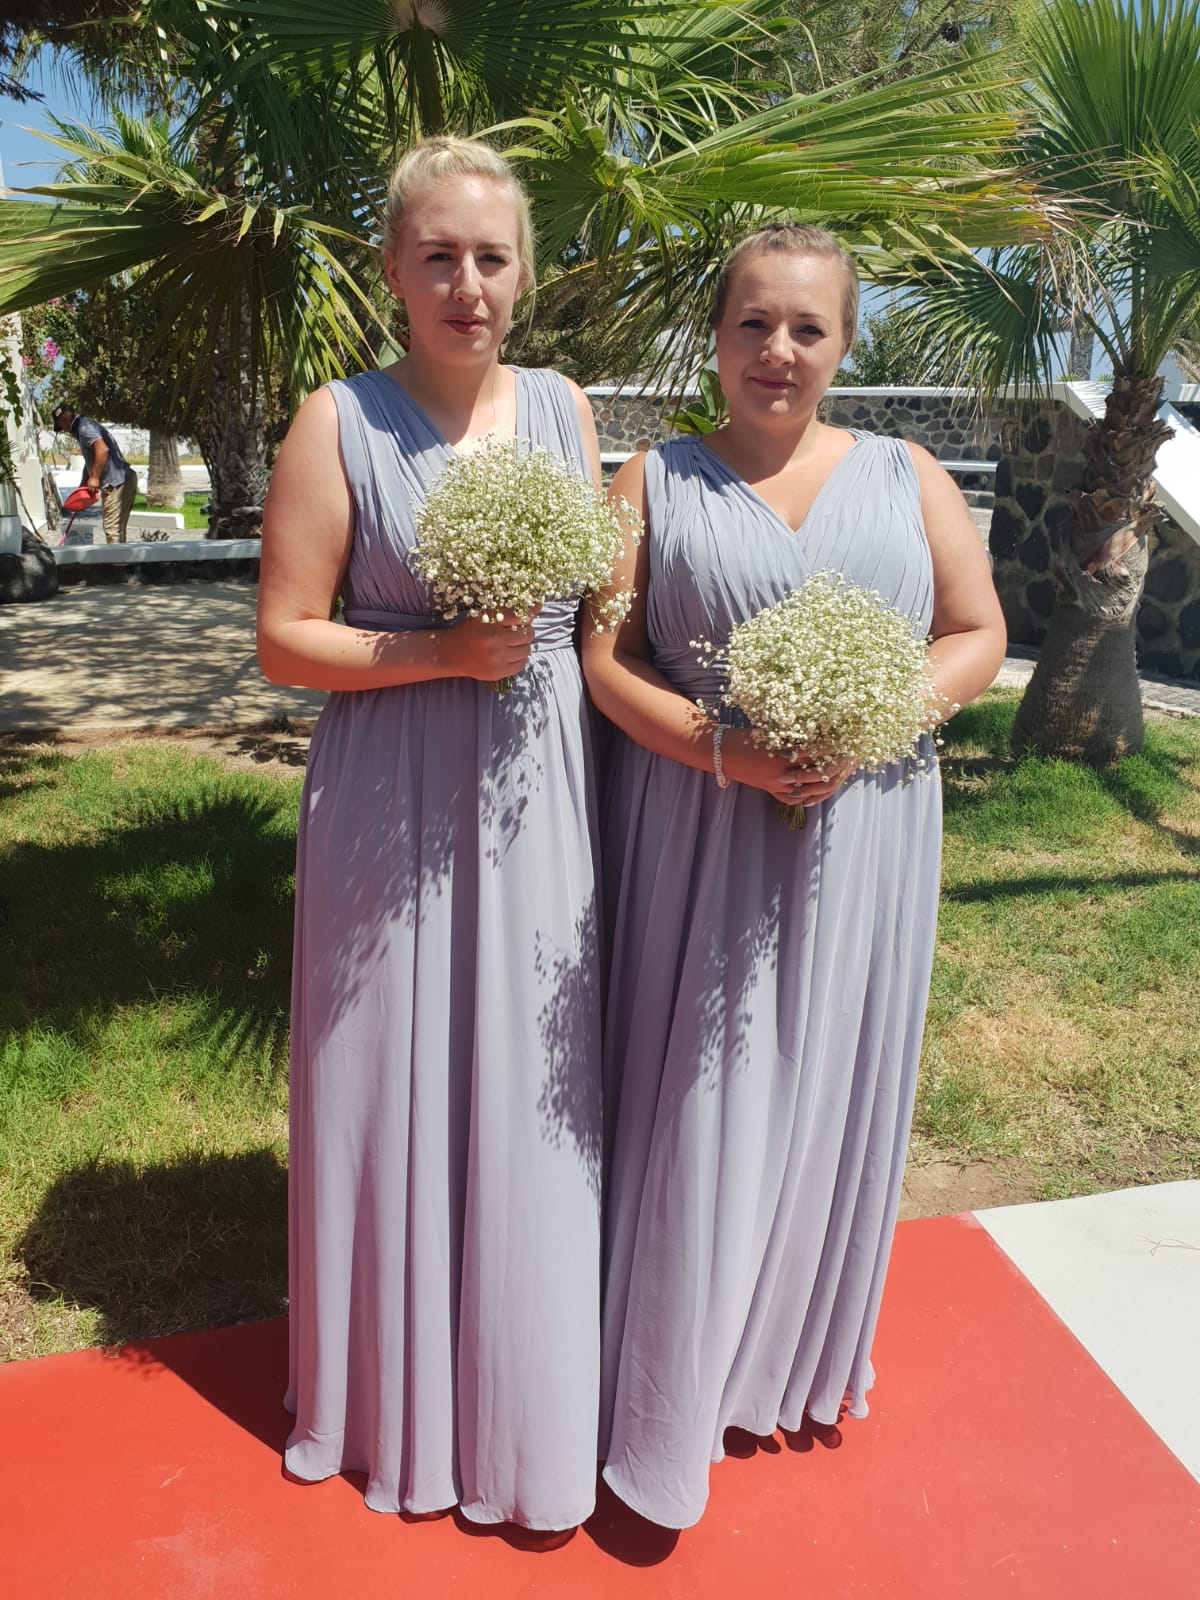 Leanne Holland's bridesmaids